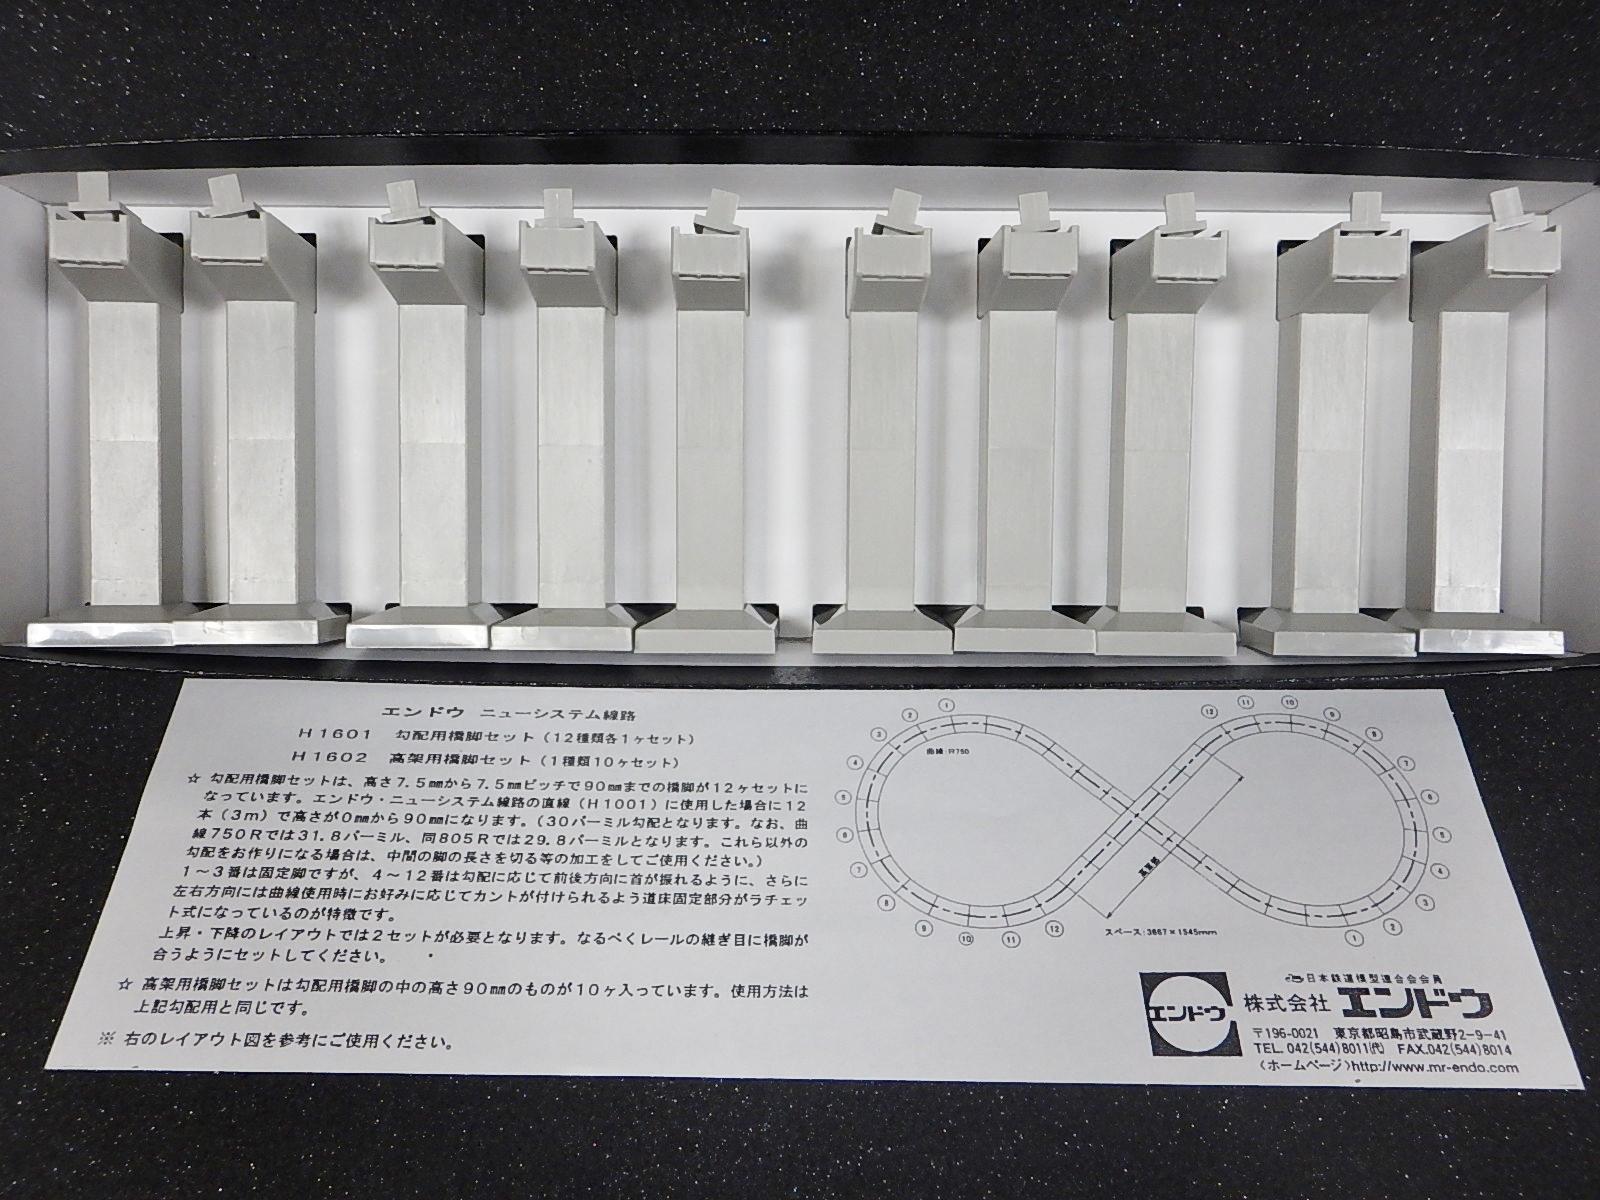 高架橋脚10脚セット(90mm高架用)